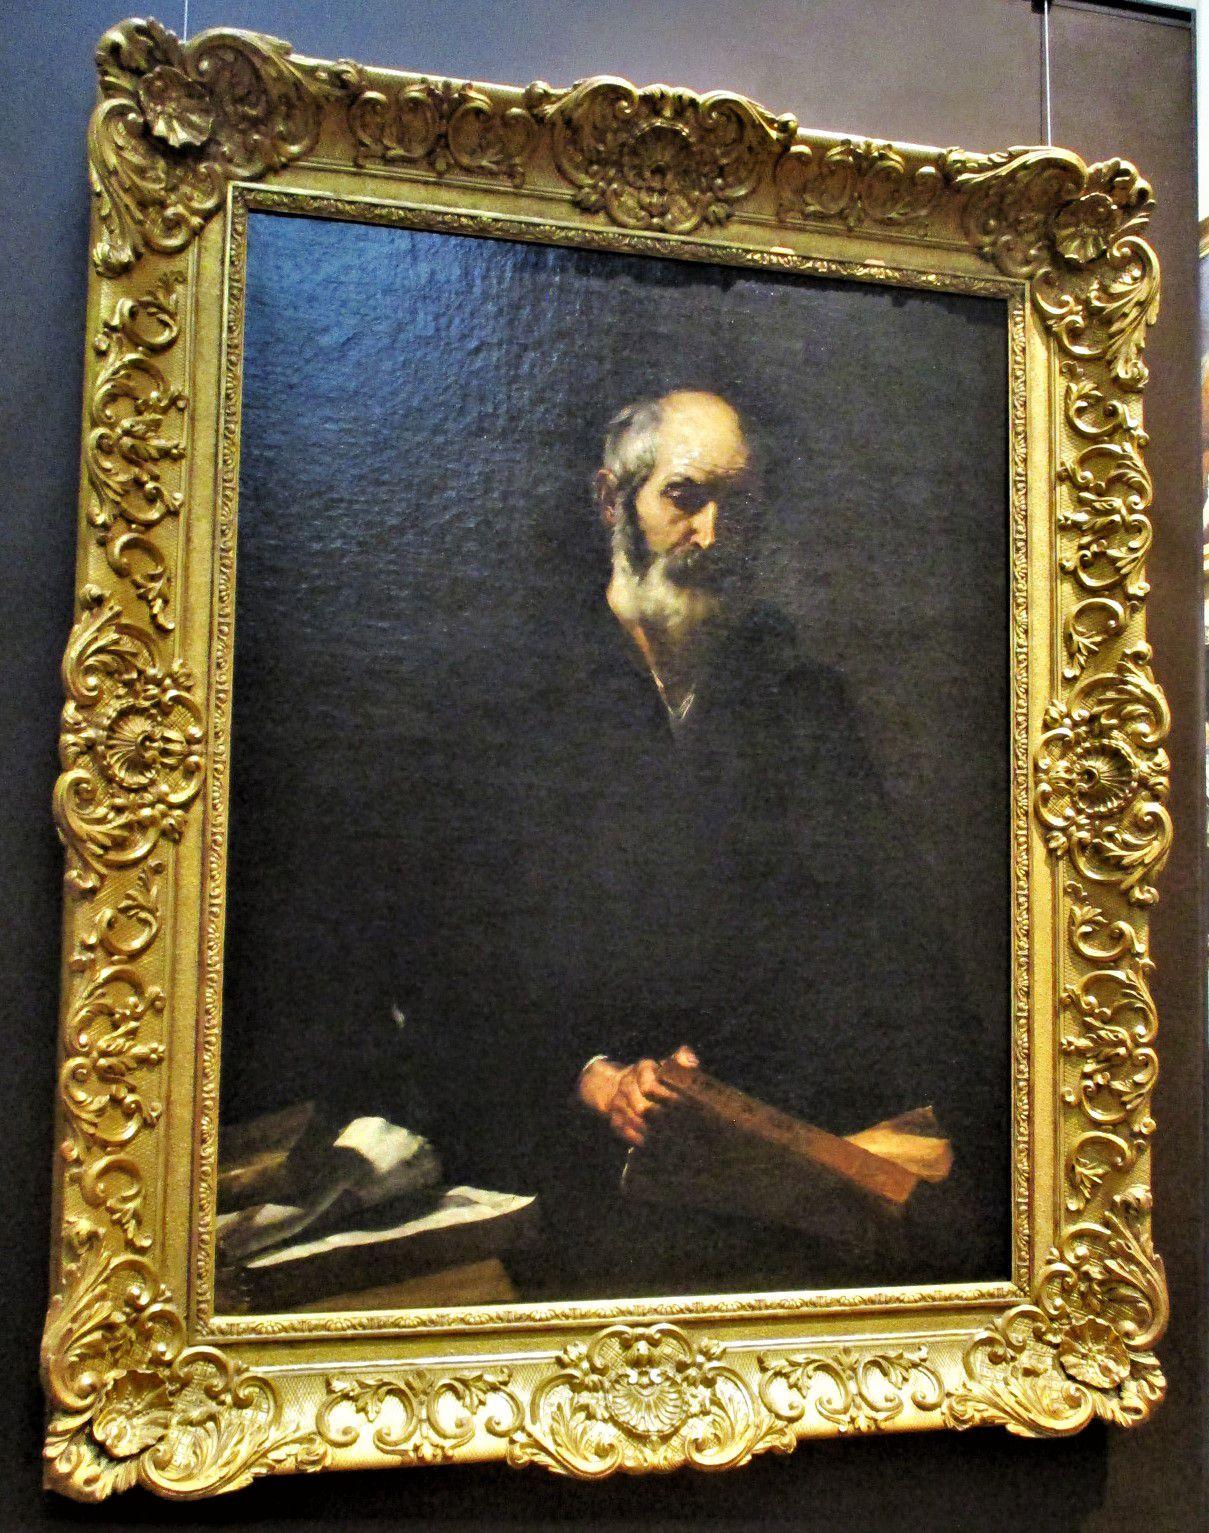 Platon - Jusepe de Ribera, 1630